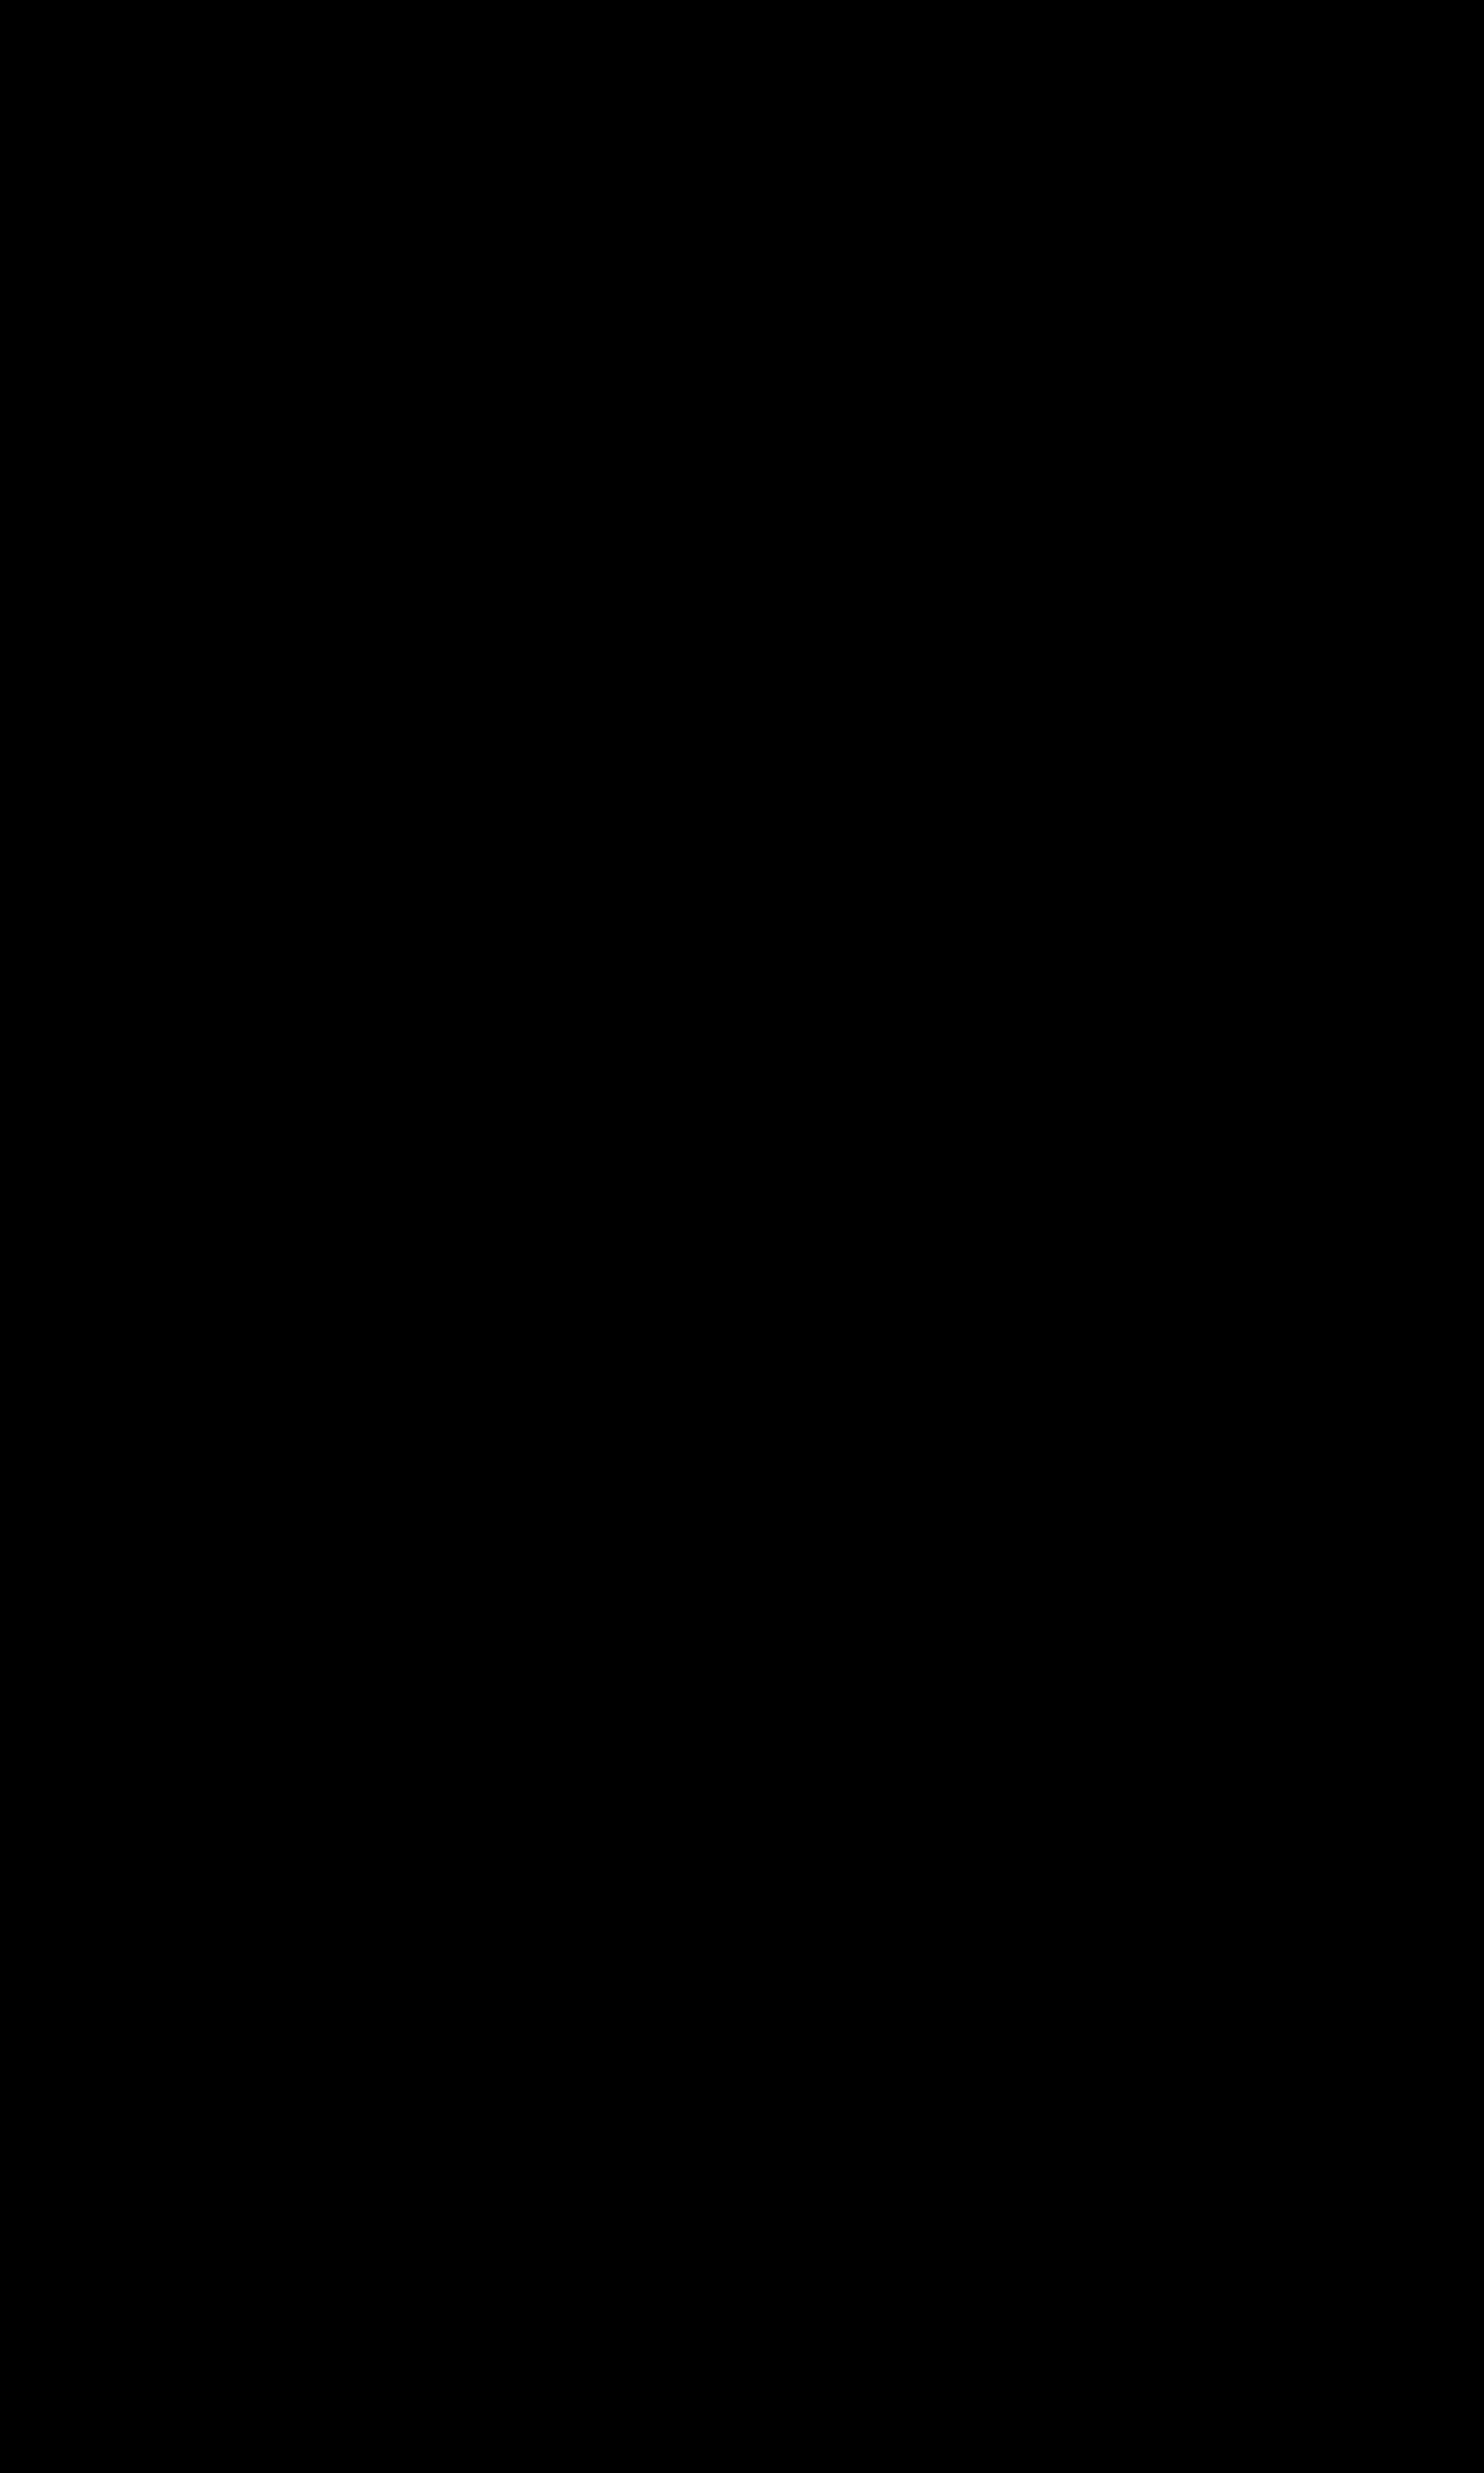 Cent Symbol Clipart - Clipart Kid